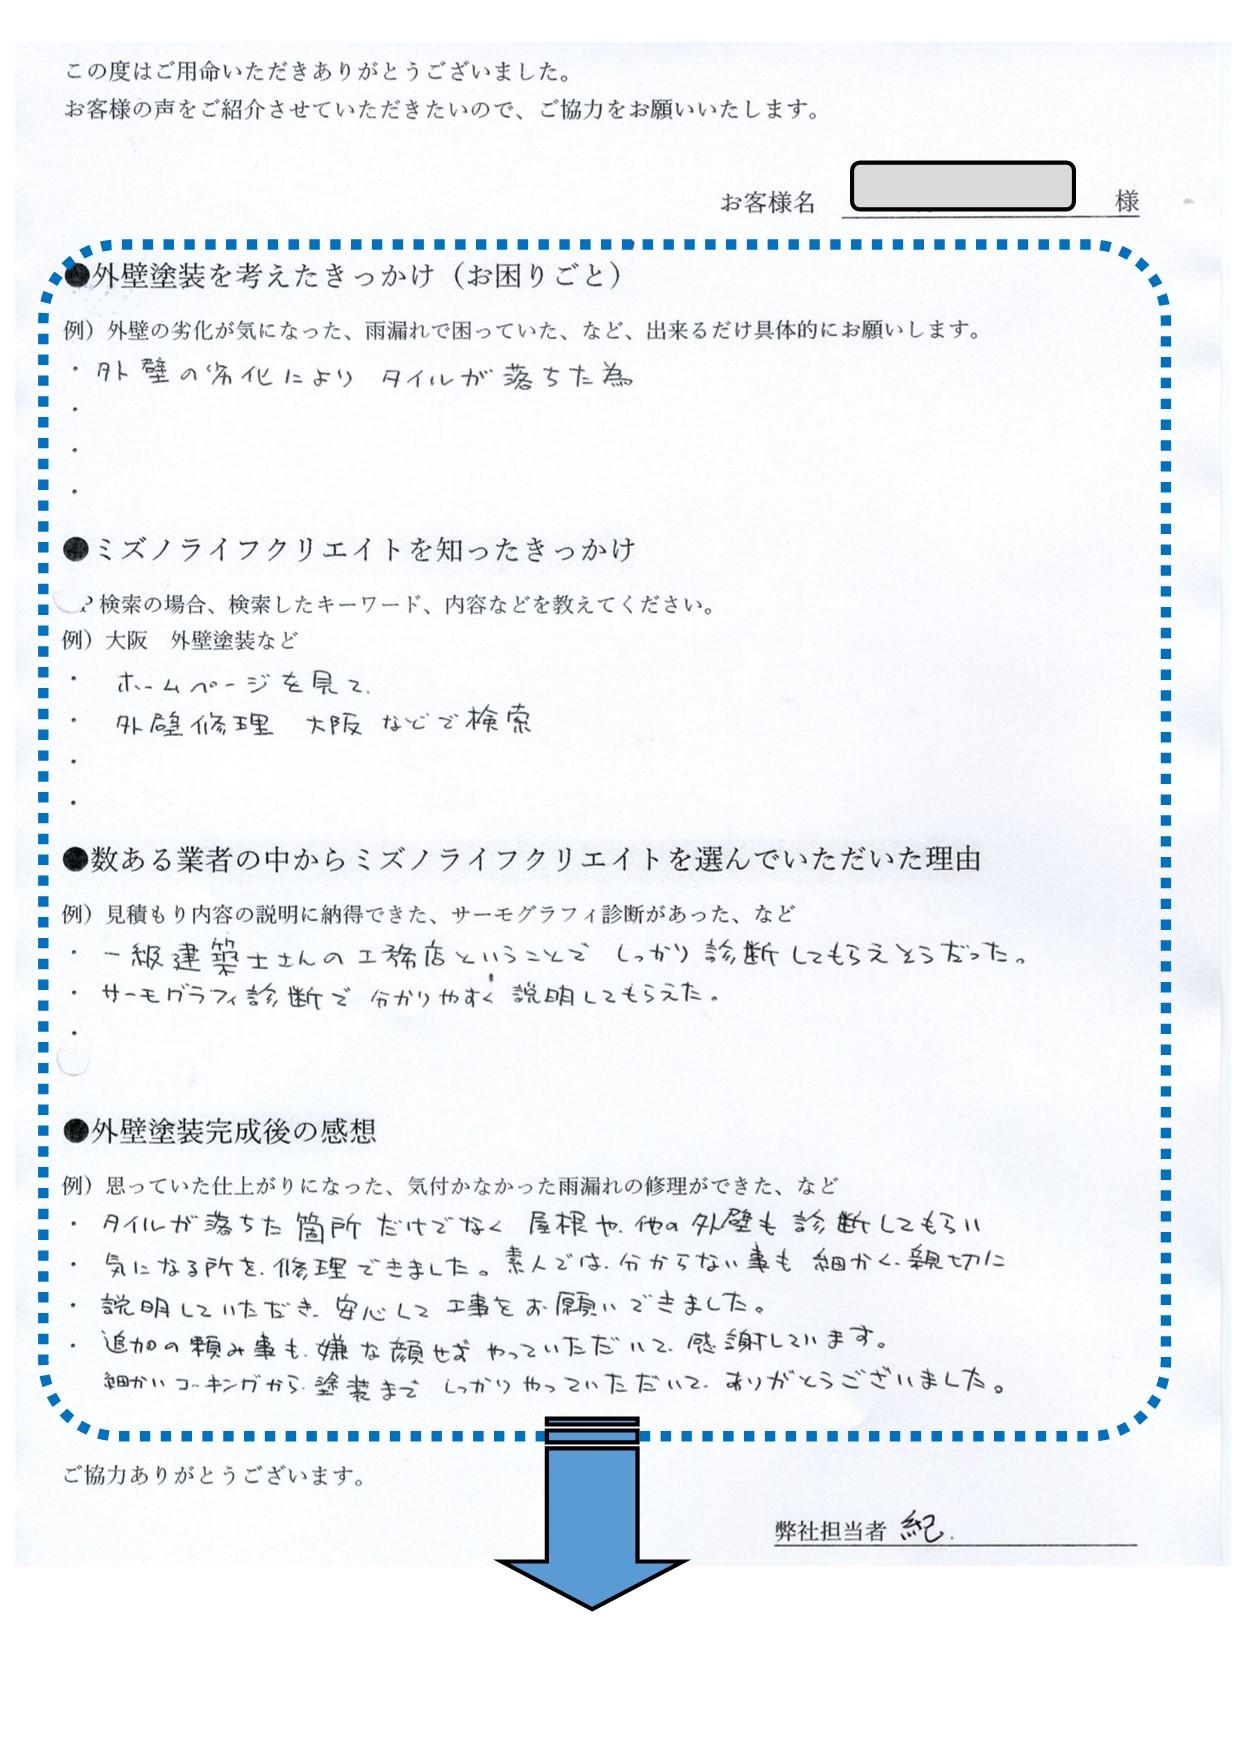 M様 お客様の声(コメント)